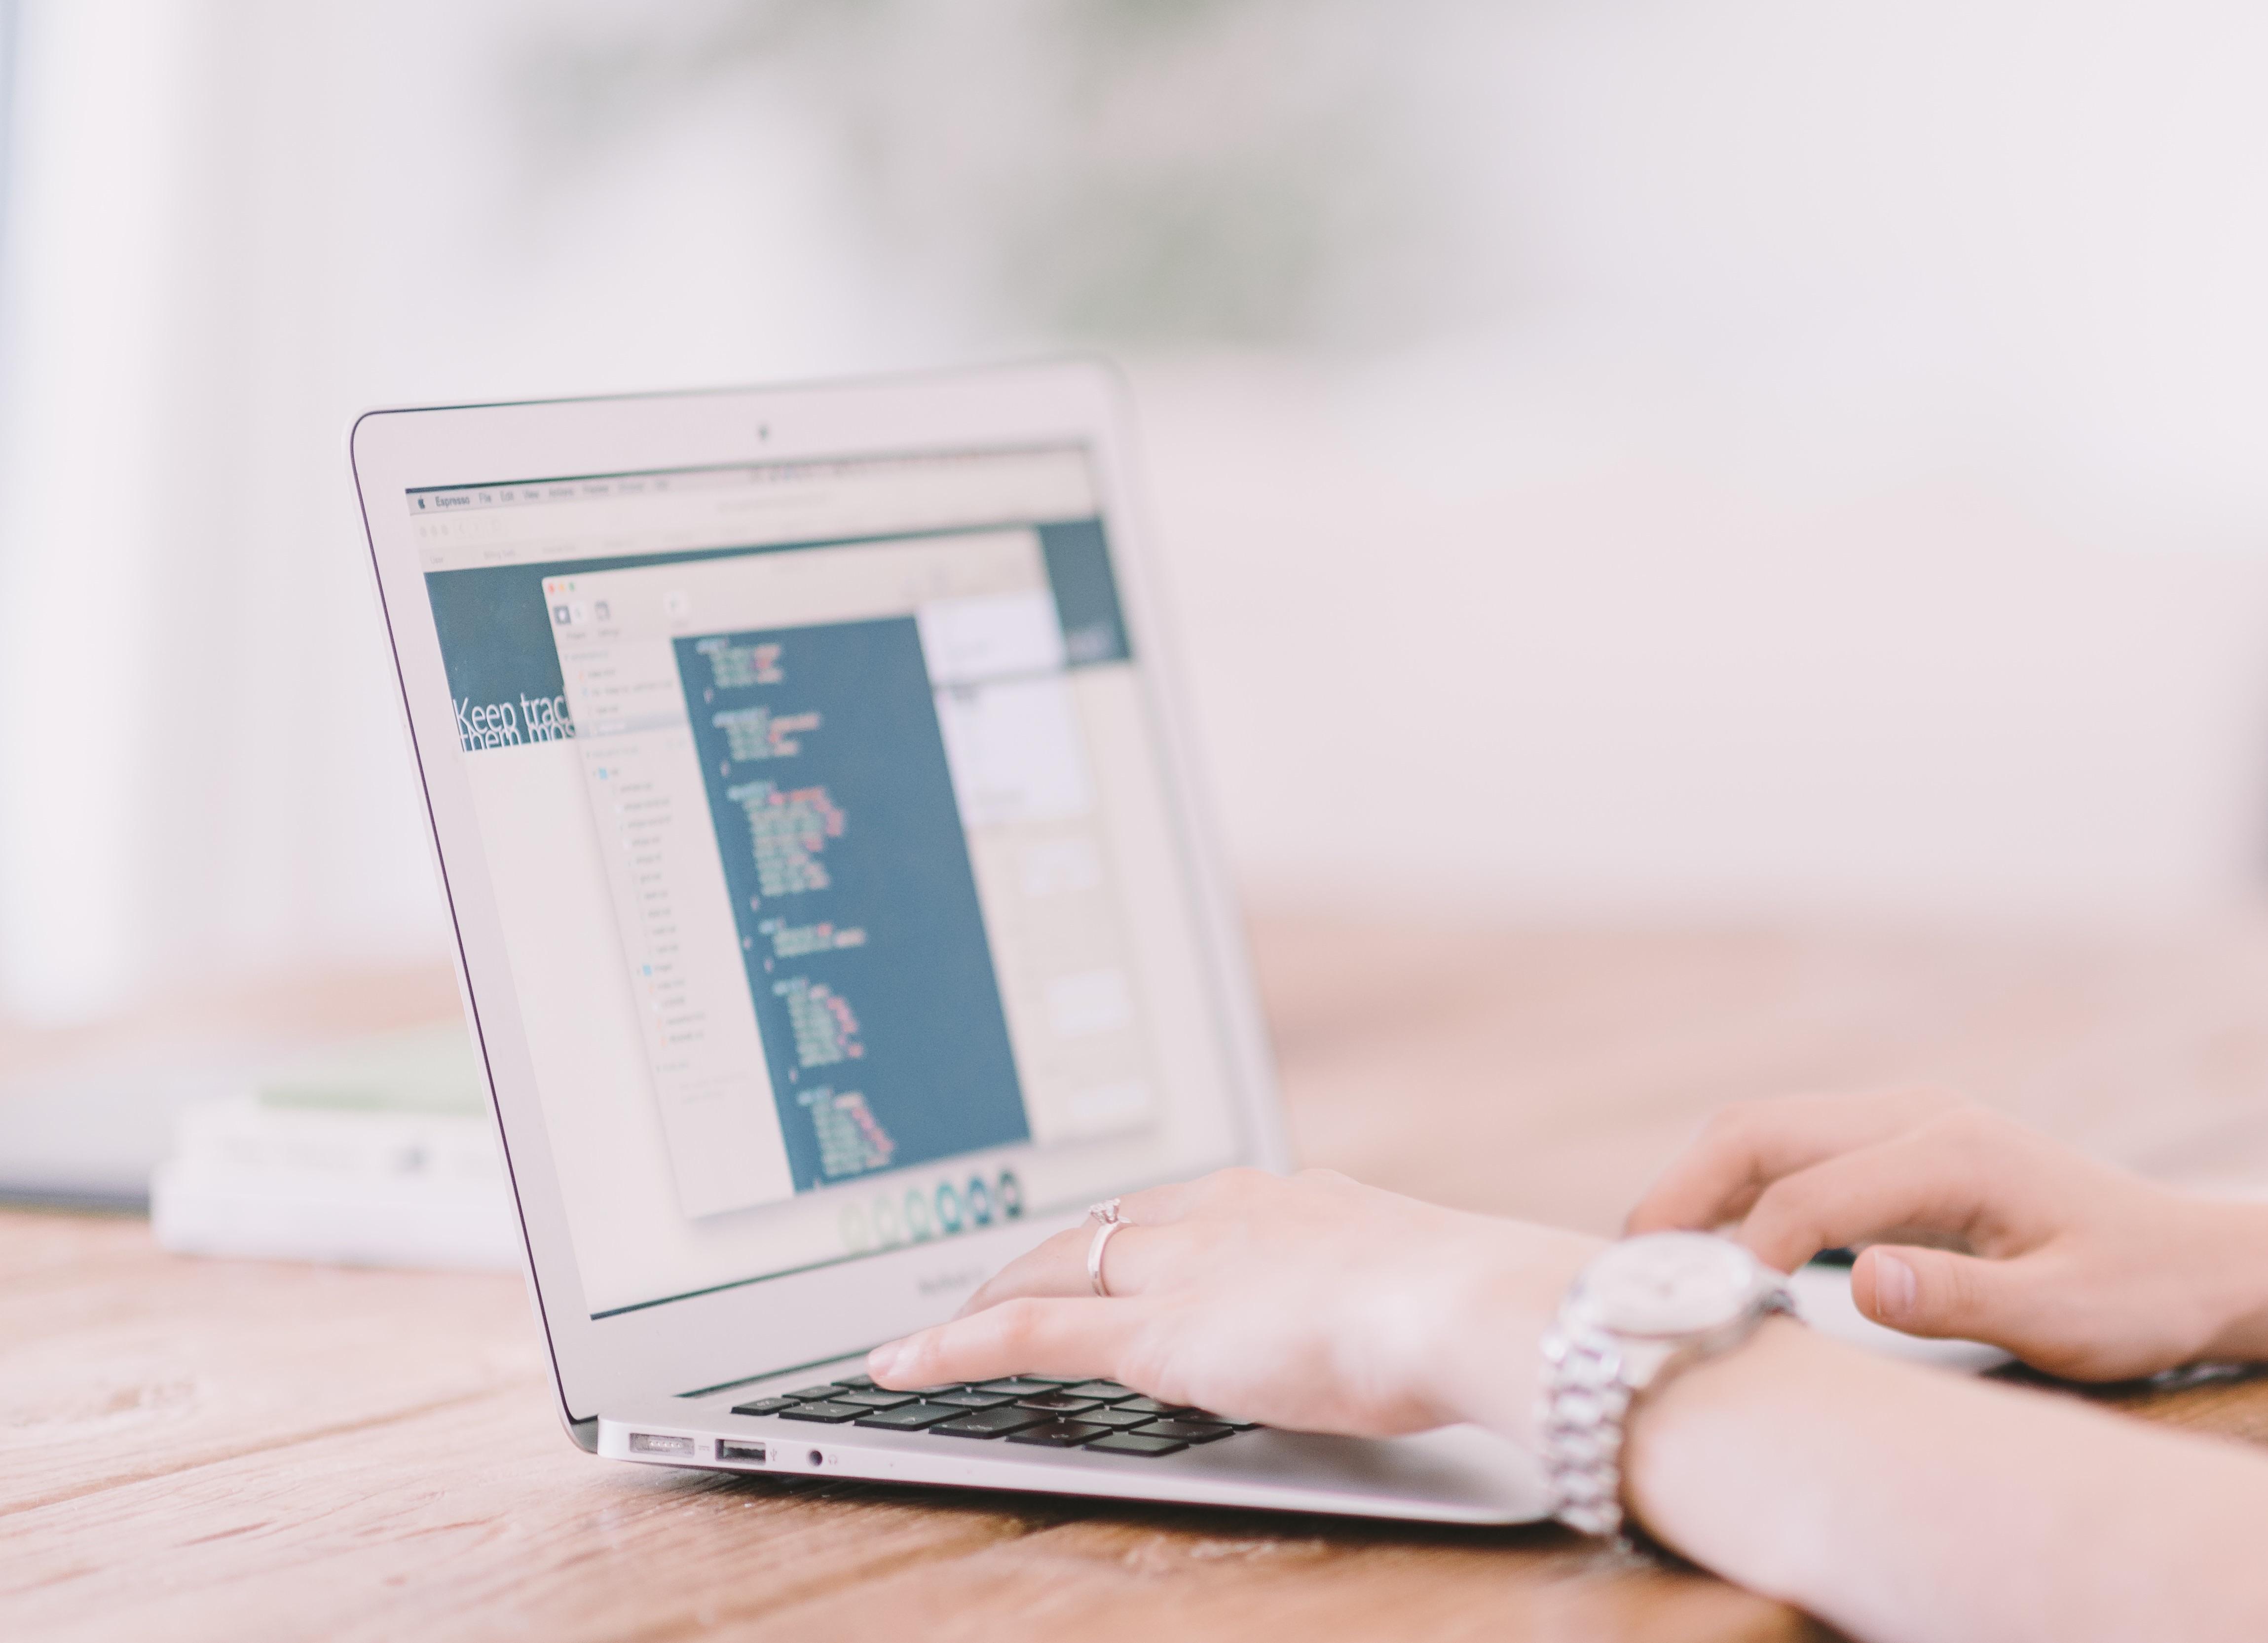 What Are The Metrics Around Digital Marketing Adoption?